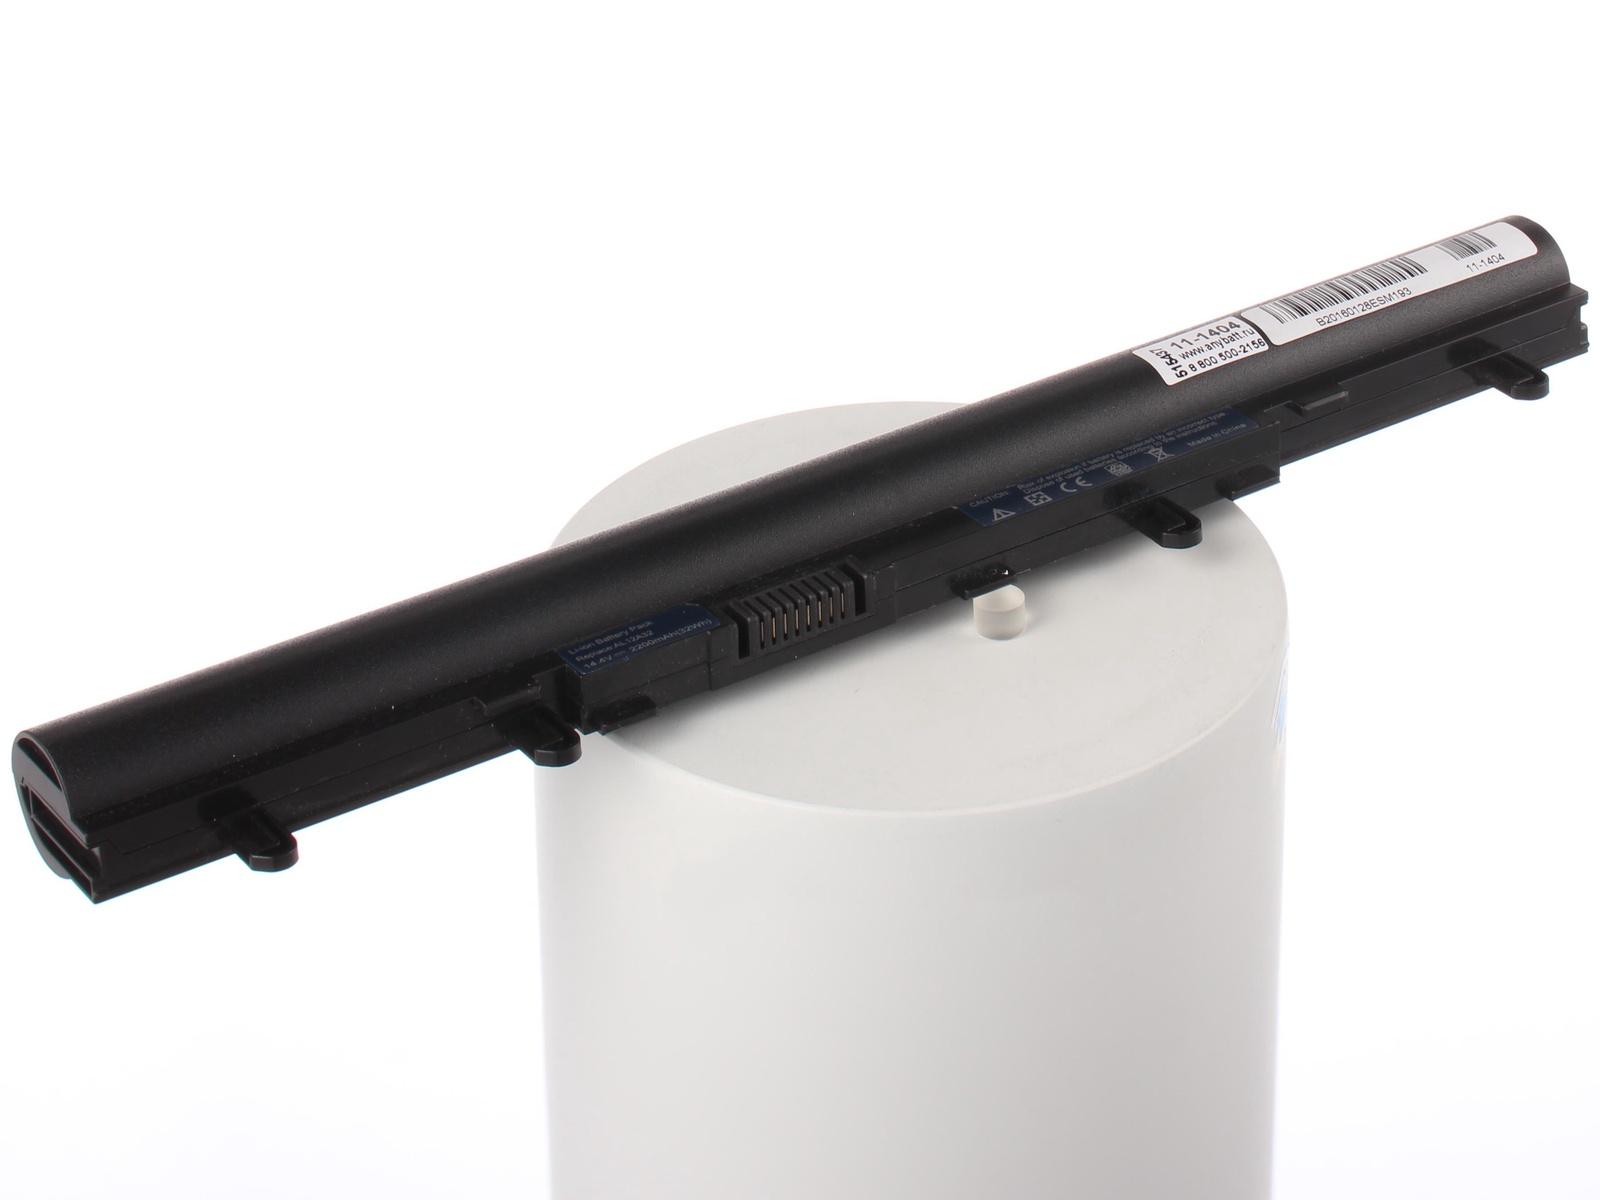 Аккумулятор для ноутбука AnyBatt для Acer Aspire E1-522-45004G1TMnkk, Aspire V5-571G-32364G50Mass, Aspire V5-571G-52466G50Mass, Aspire E1-510-28202G32Mnkk, Aspire E1-532G-35584G50Mn, Aspire E1-570G-33226G75Mn аккумулятор для ноутбука anybatt для acer aspire e1 532g 35584g50mnkk aspire e1 570g 33214g32mnkk aspire v5 571pg 73536g75ma aspire e1 470p 6659 aspire e1 522 12504g50mn aspire e1 522 45004g1tmn aspire e1 570g 33214g50mnii